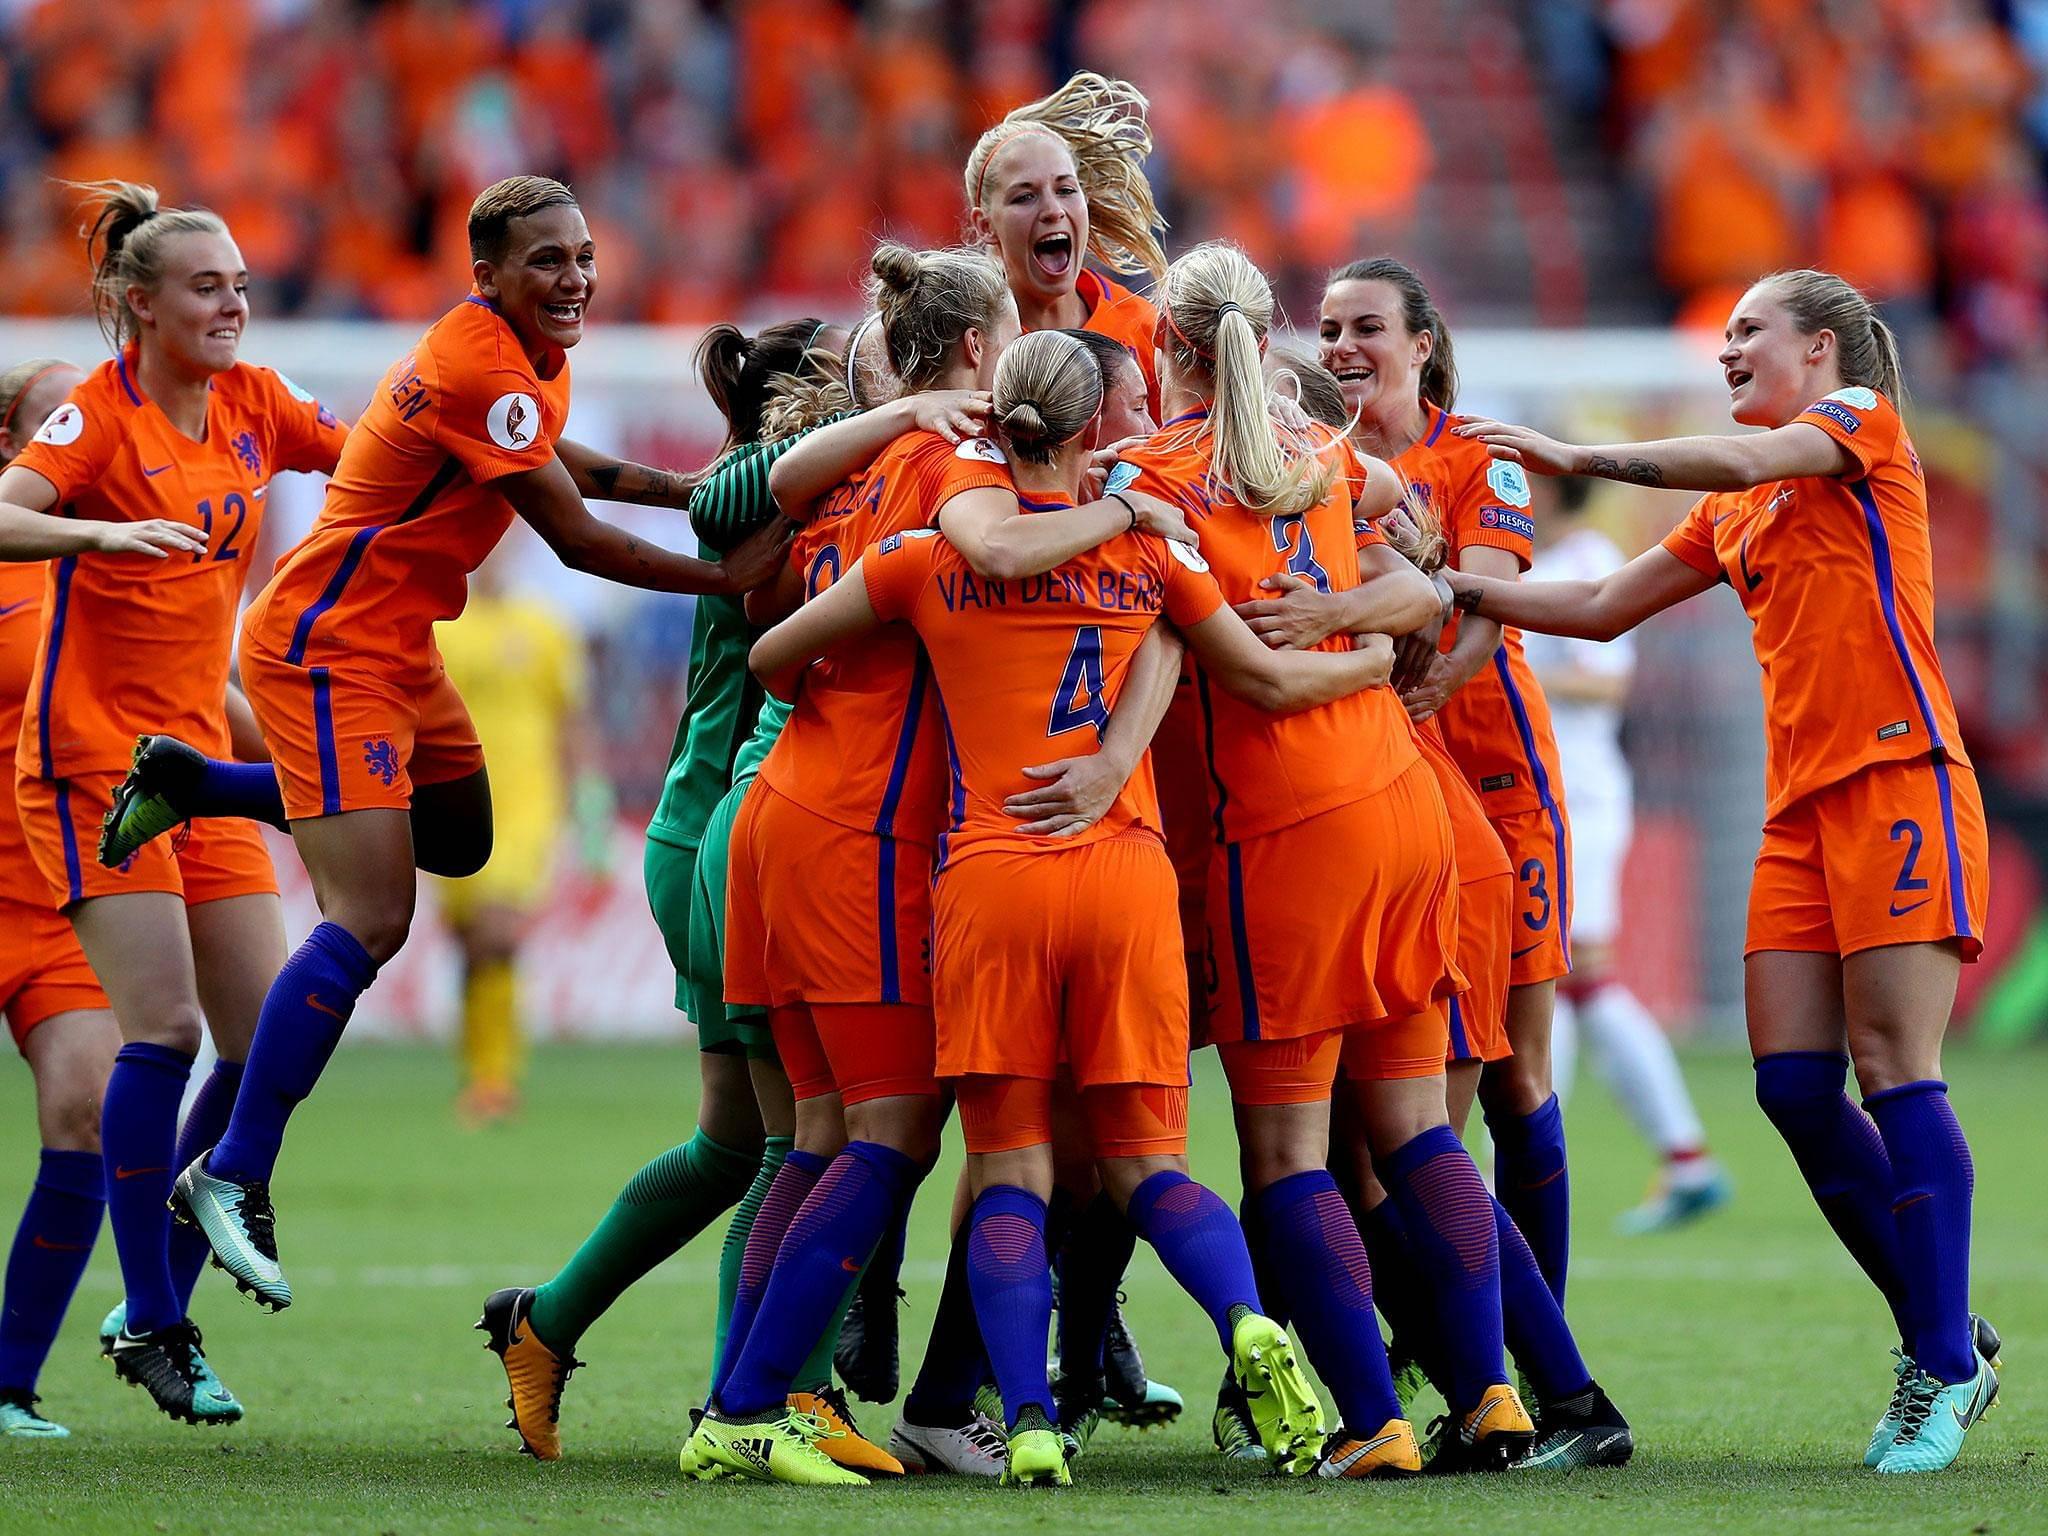 NED-W Vs CN-W Dream 11 prediction: Dream 11 fantasy tips for Netherlands Vs Canada for Women FIFA World Cup 2019